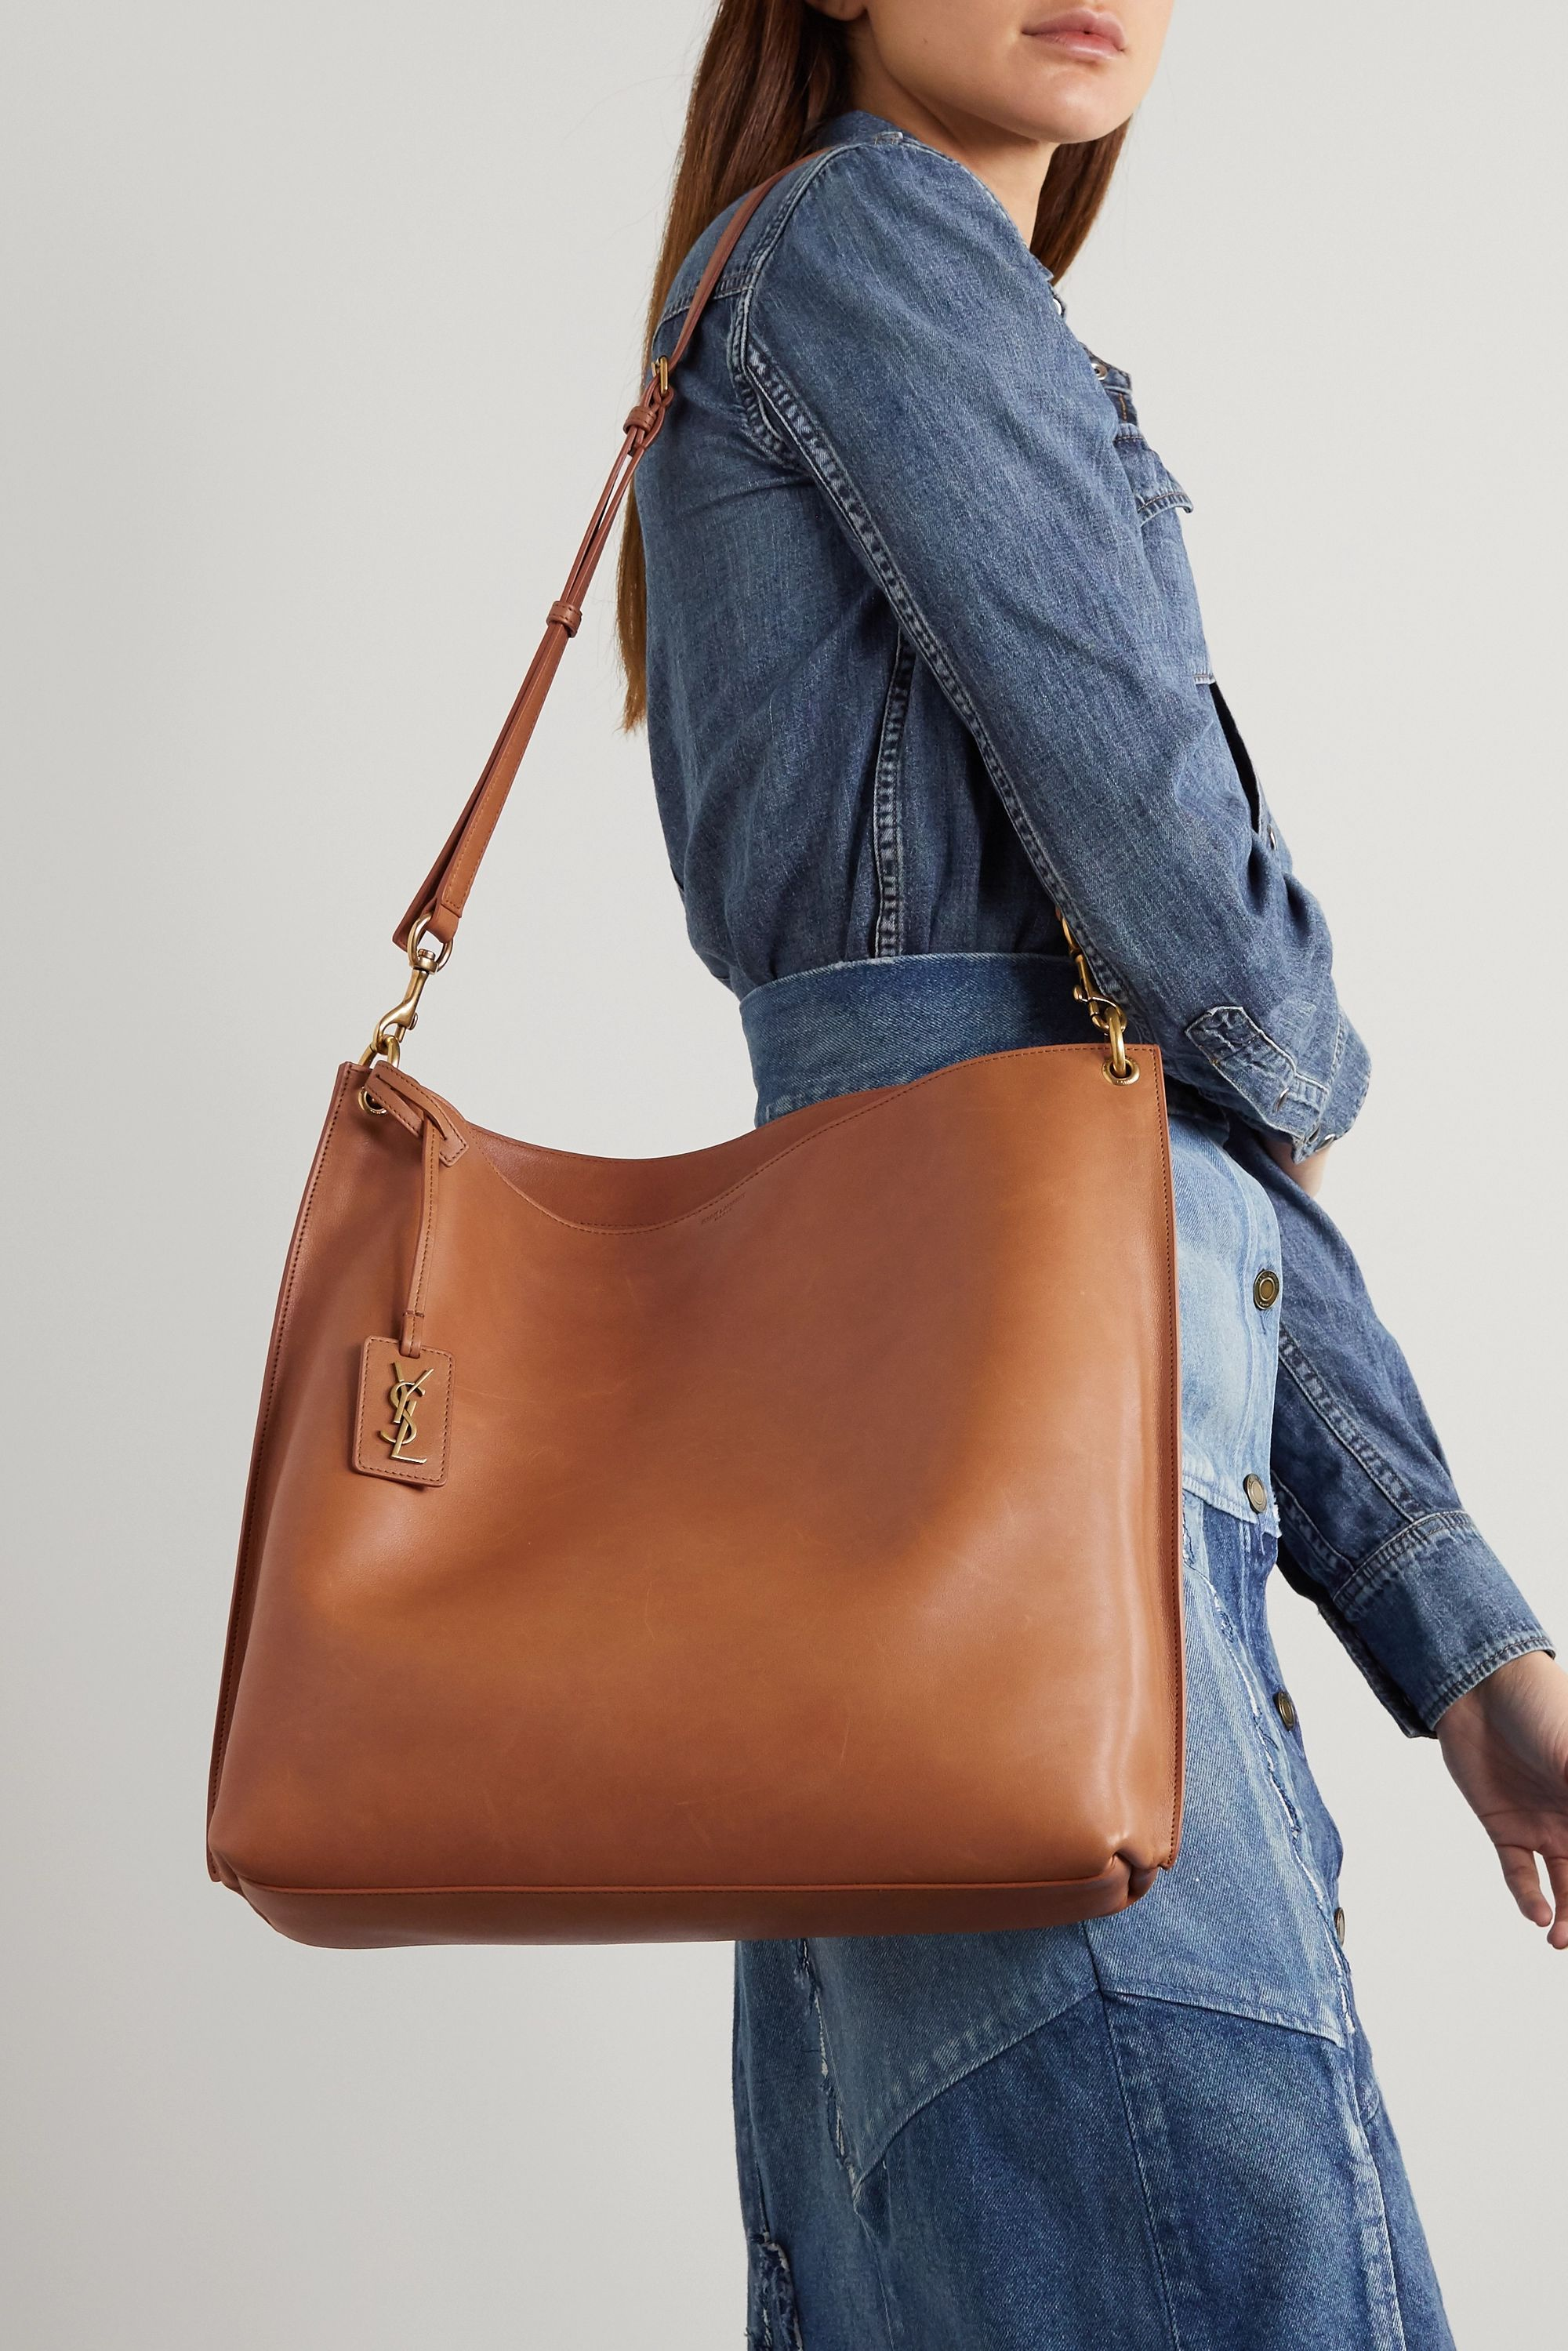 b723837e21e65c558708c90047708afd Yves Saint Laurent bag : Tag leather tote